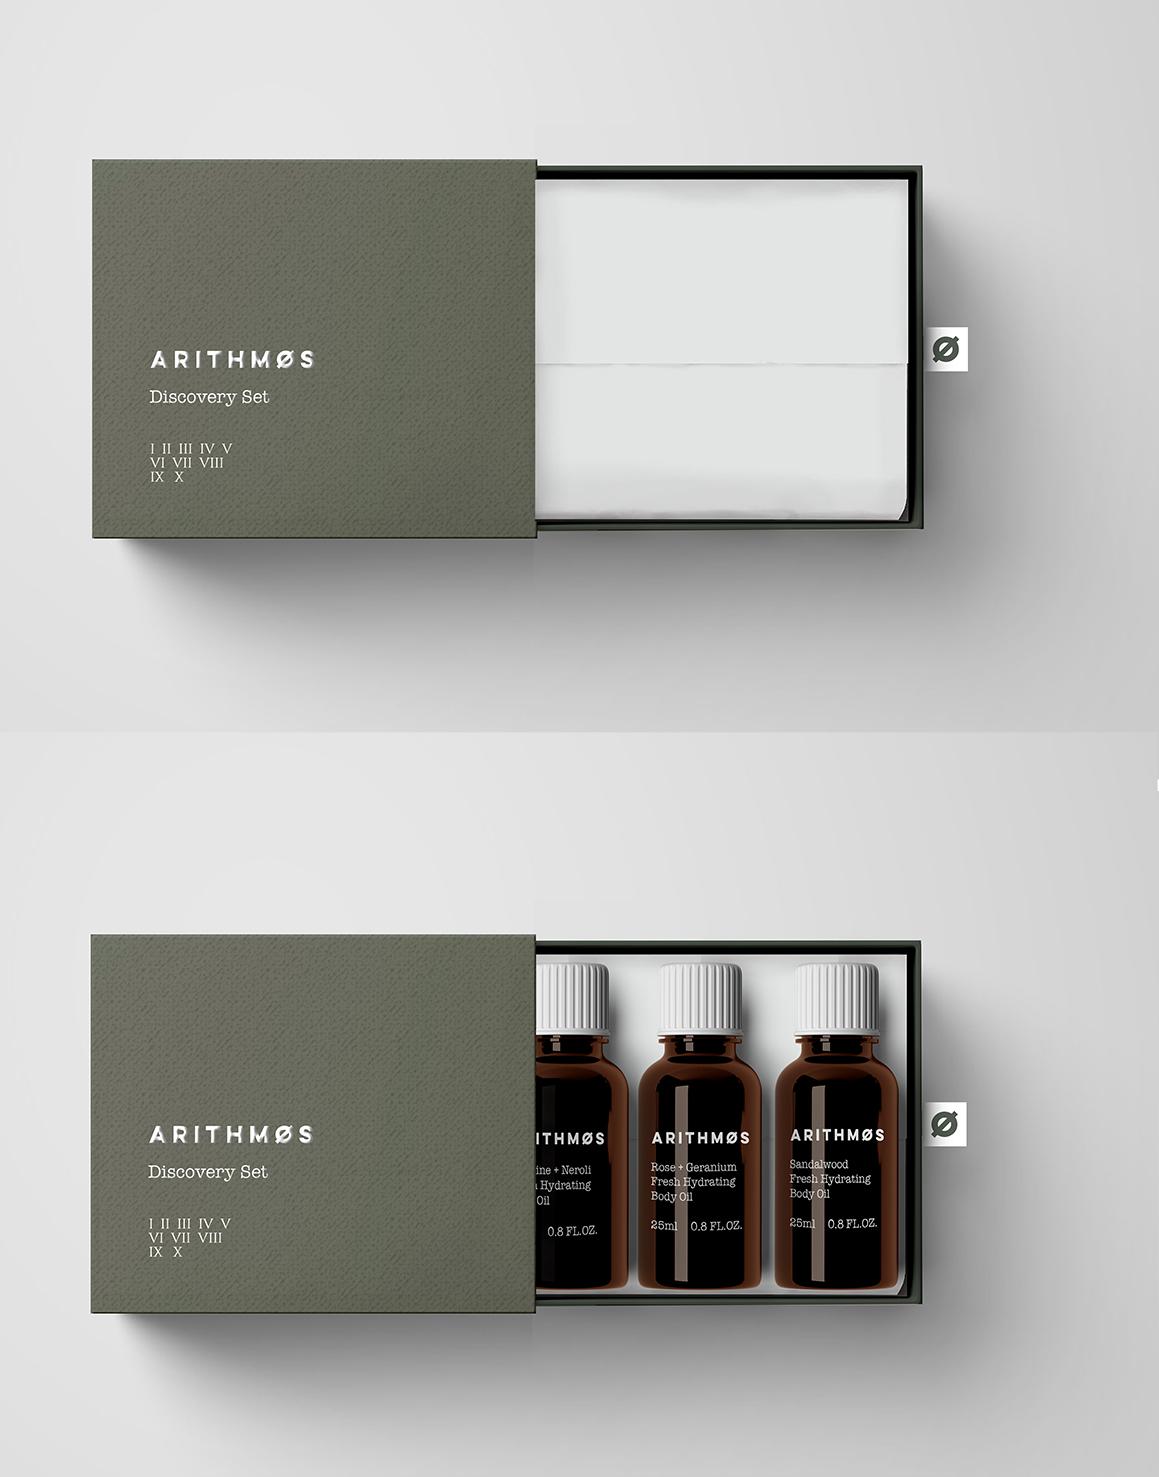 Arithmos Cosmetics